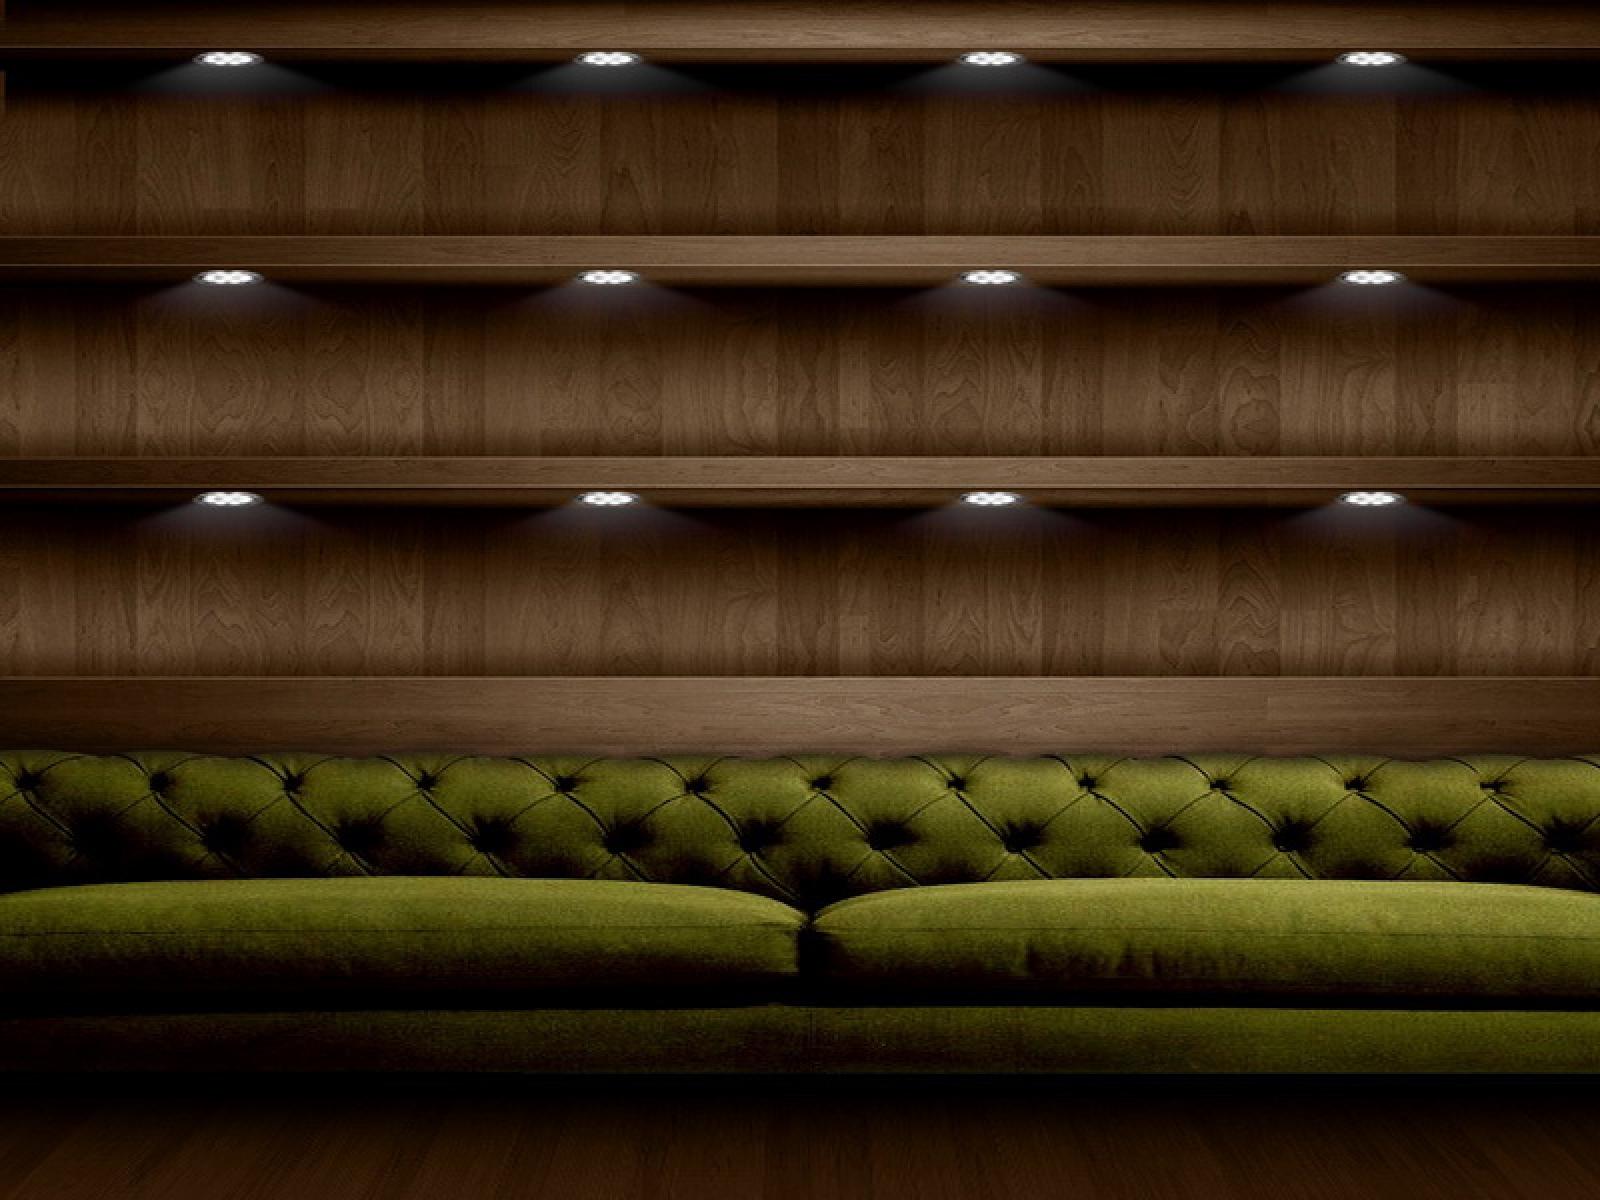 desktop shelves ideas - photo #32